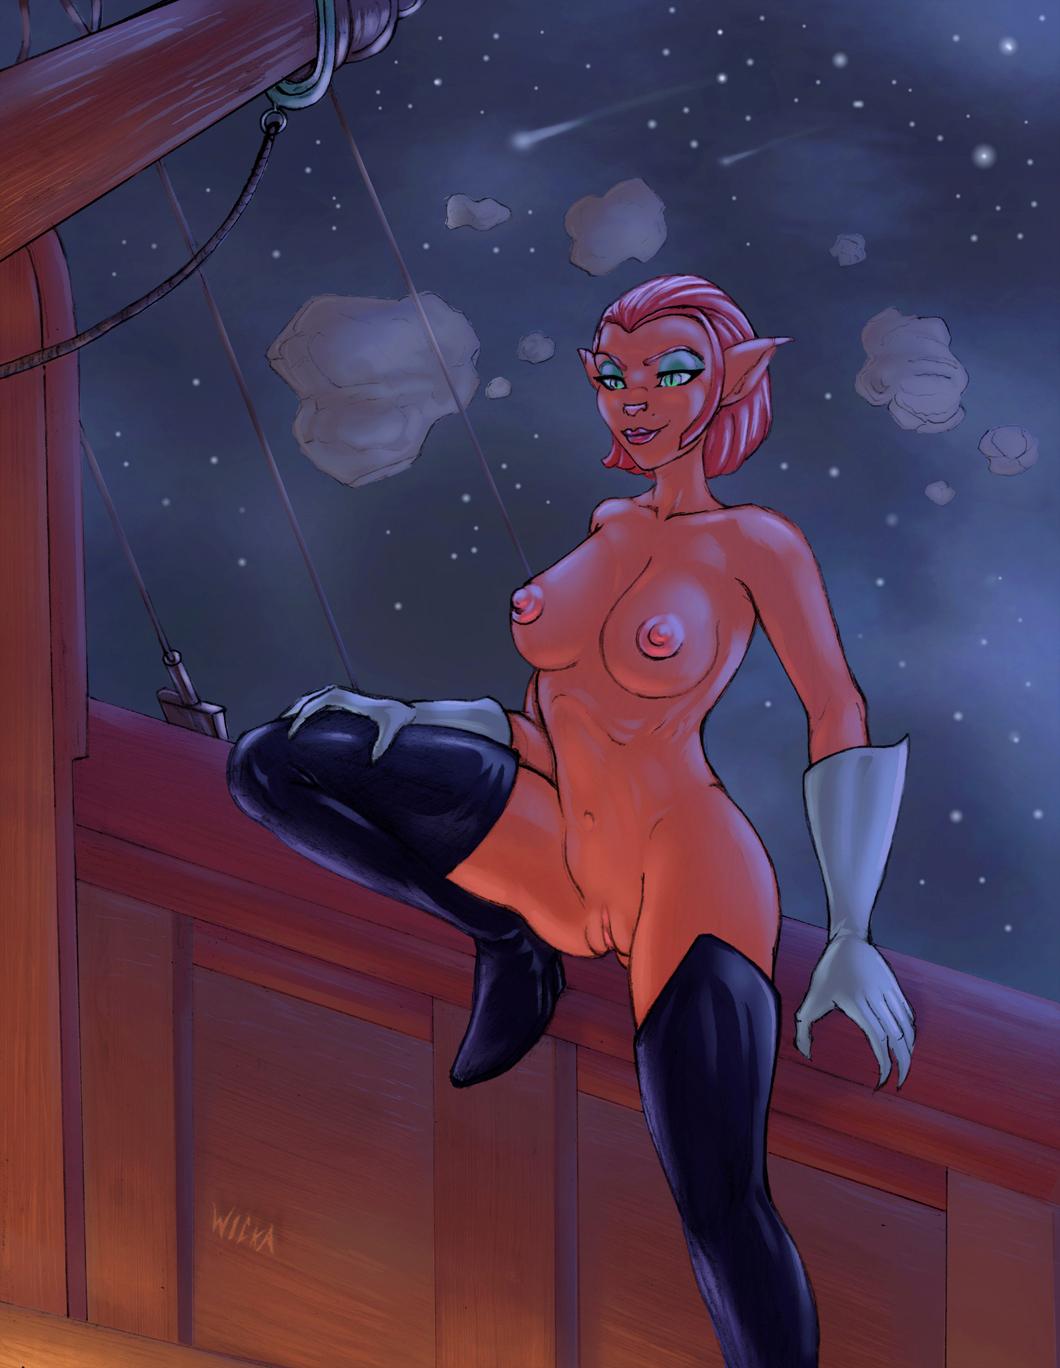 amelia planet treasure captain hentai Five night at sonic 4